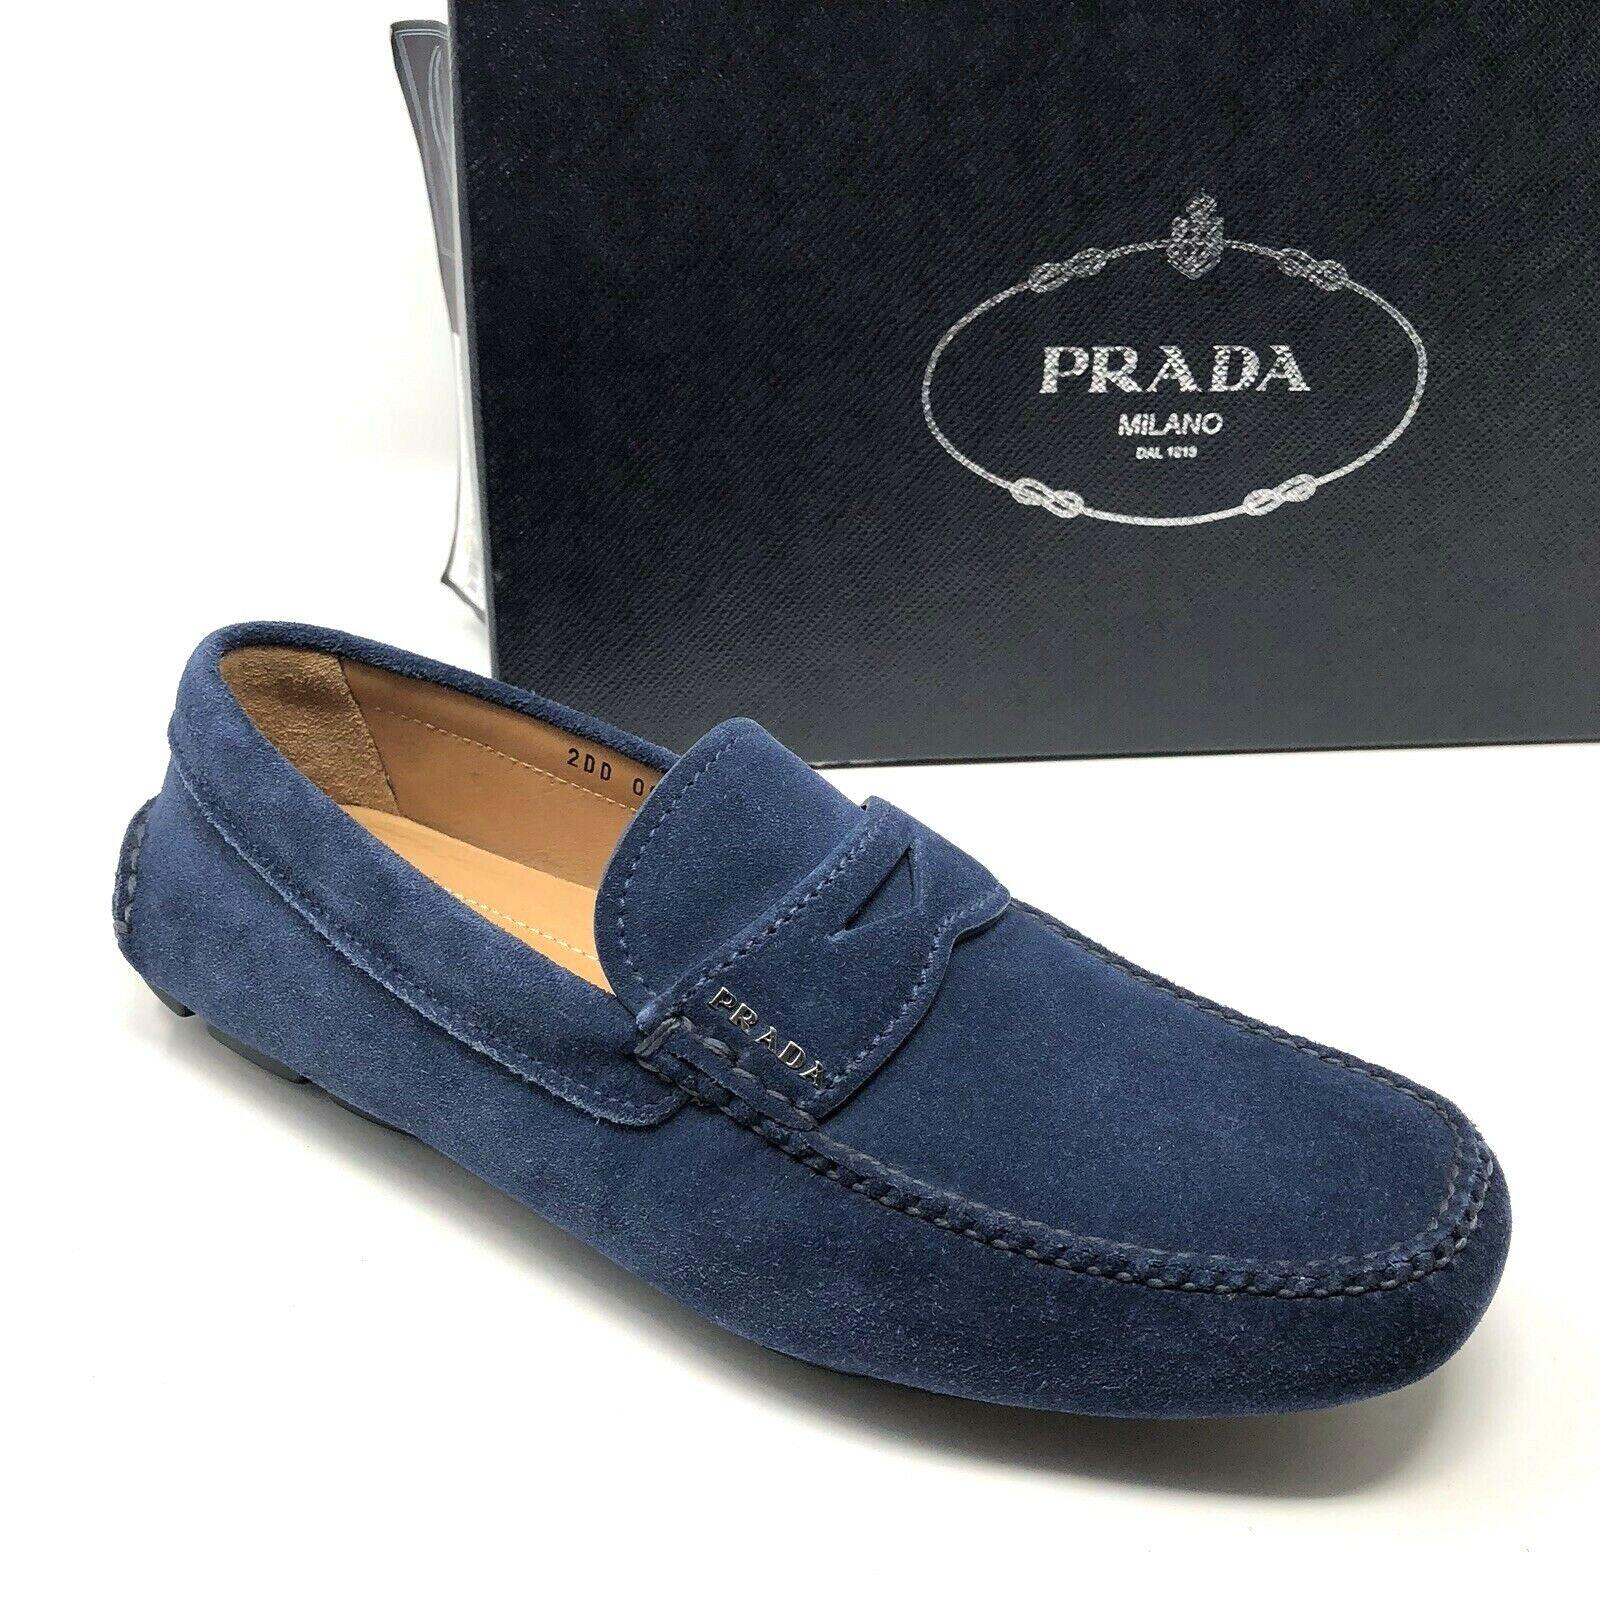 725 New PRADA Mens Suede bluee Loafers shoes Size 7.5 US 6.5 UK 40.5 EU